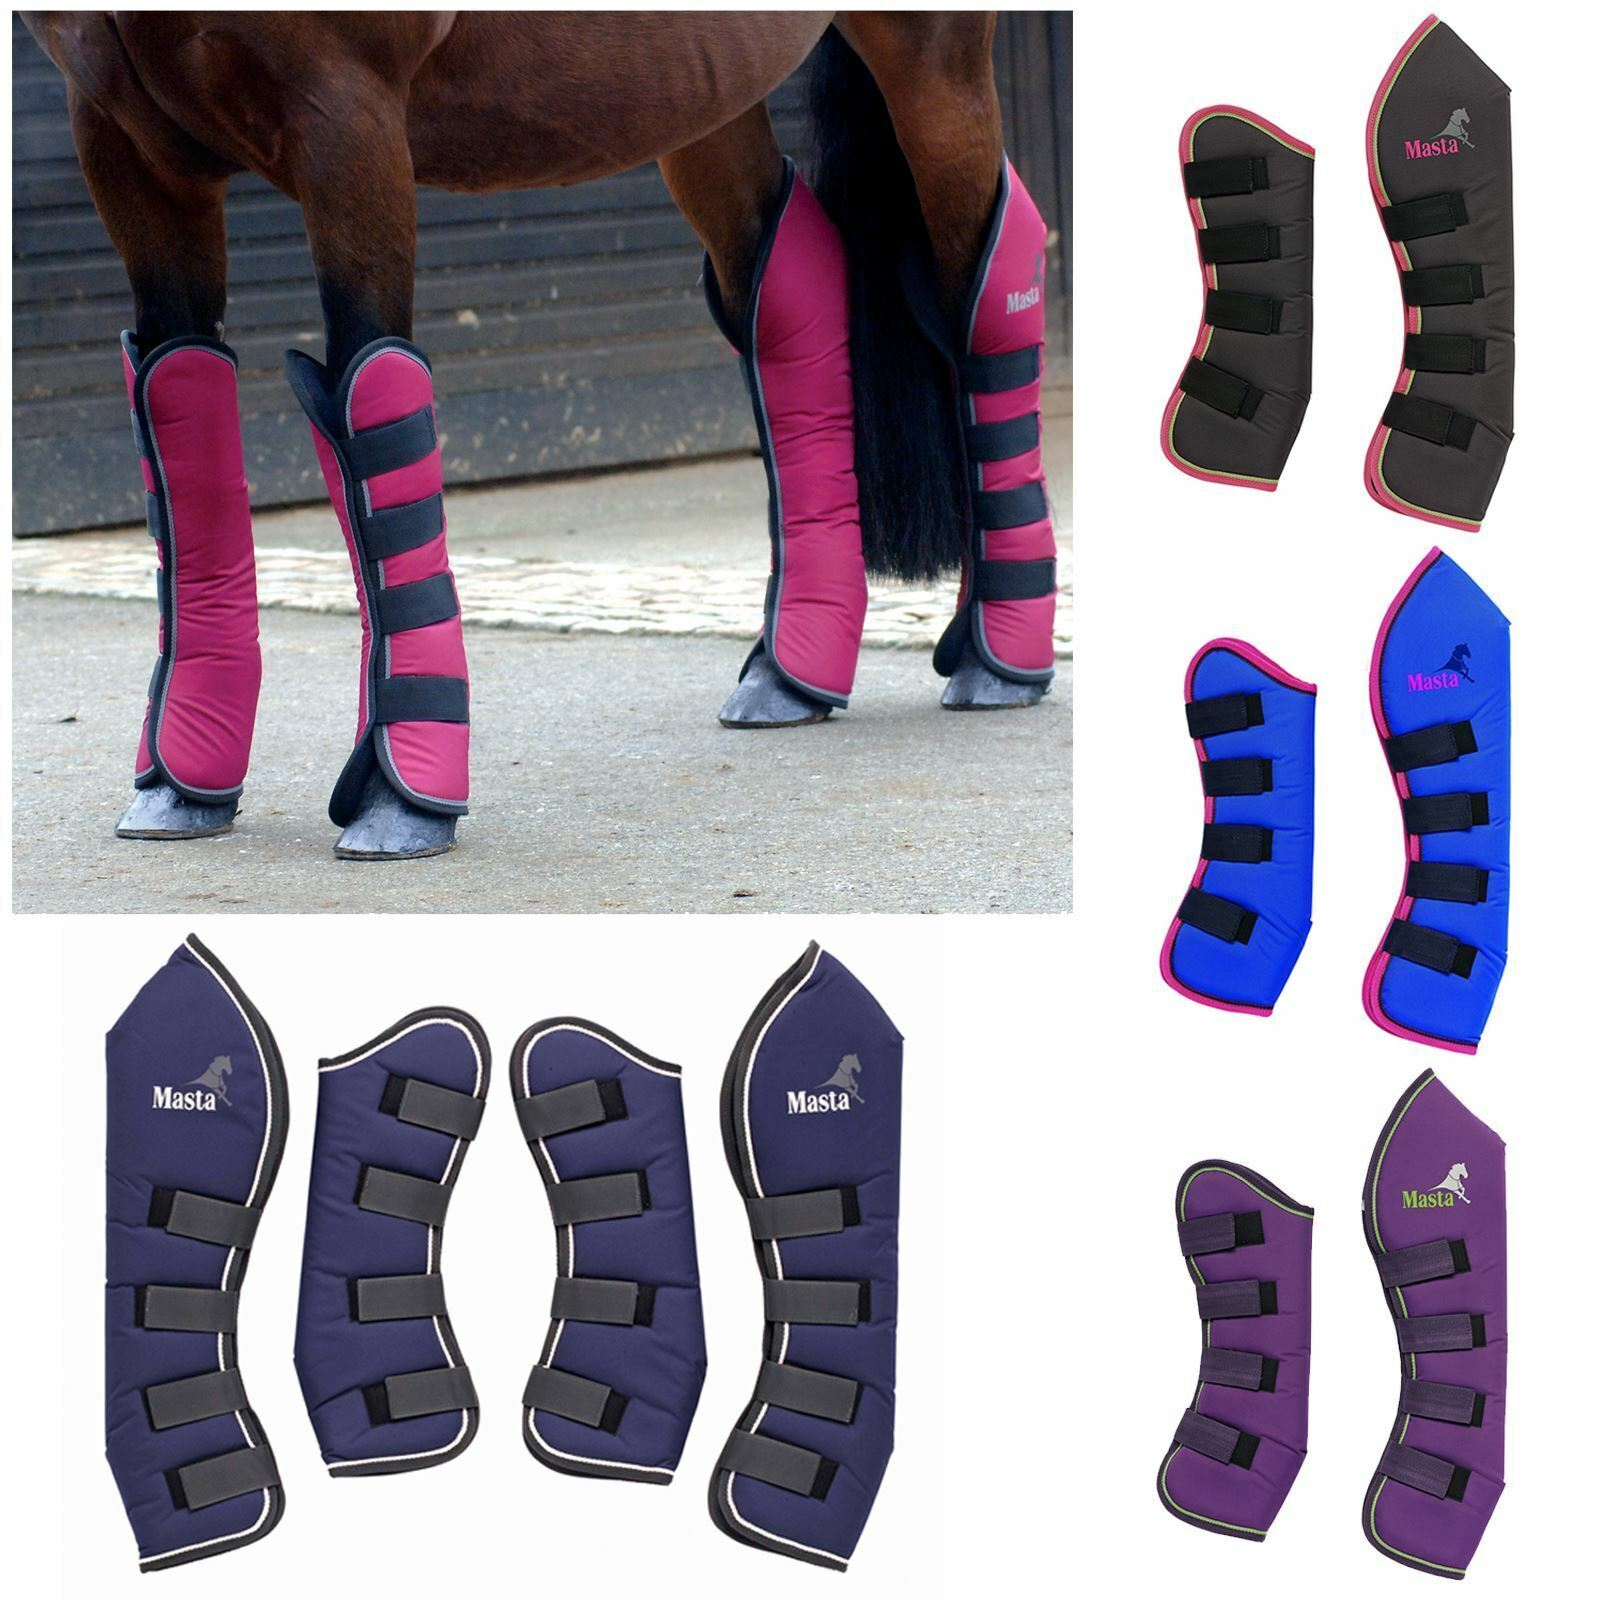 Masta Equestrian Horse Predection Mhb020 Avante Travel Boots Printed Logo